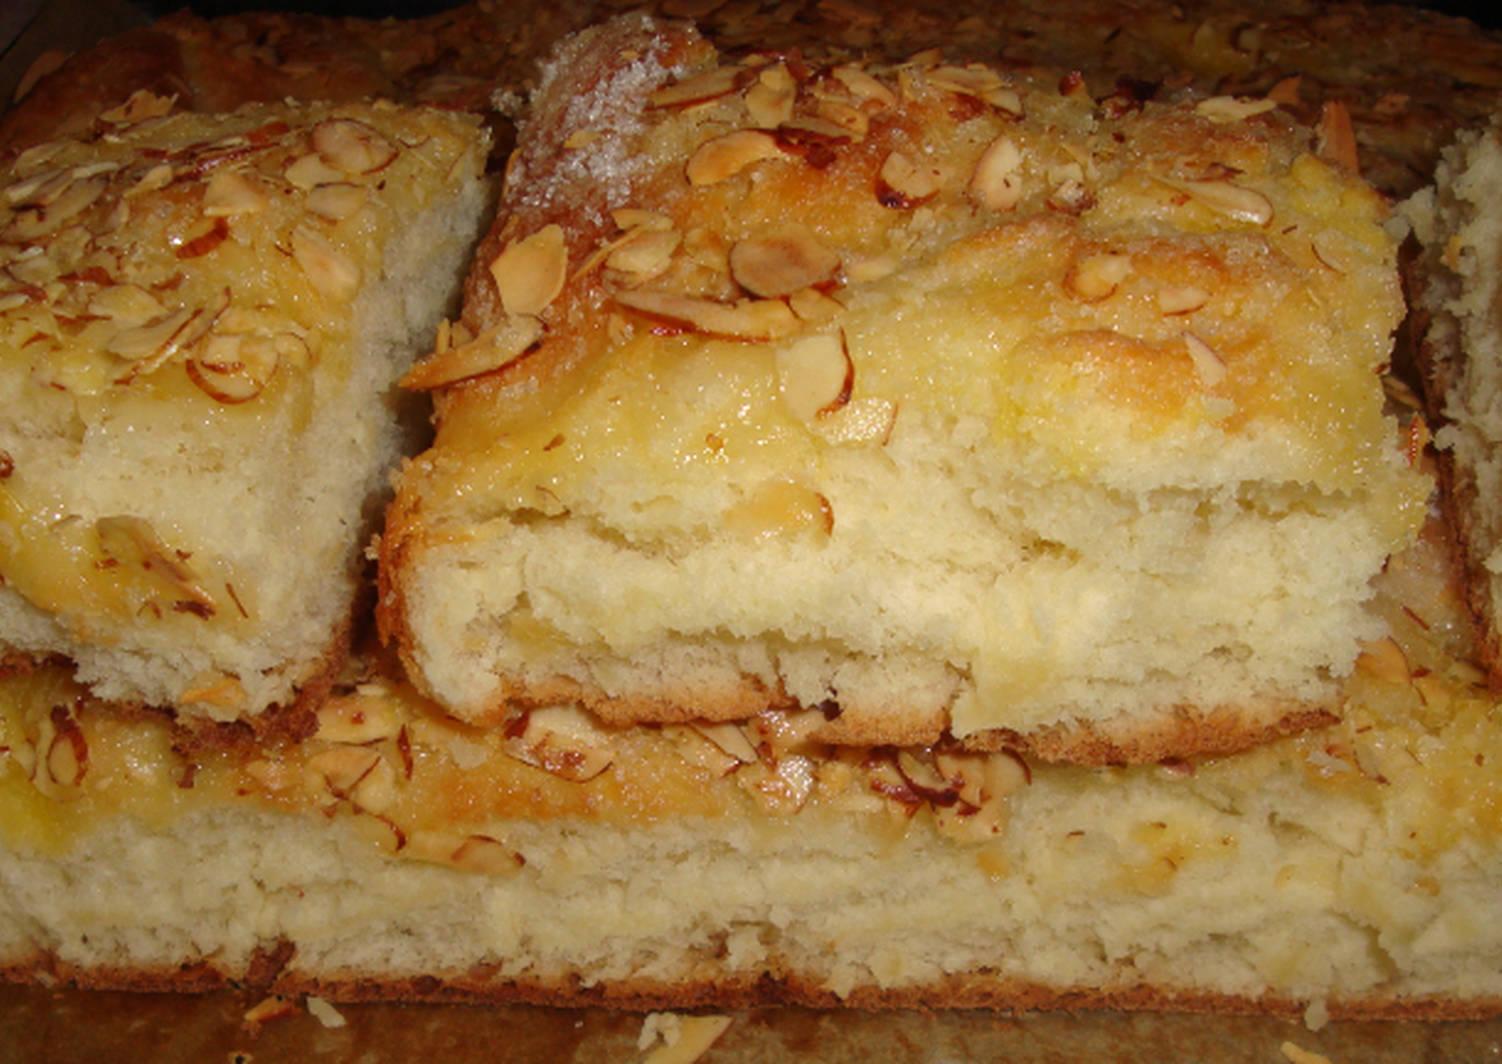 более немецкий пирог куха рецепт с фото фото